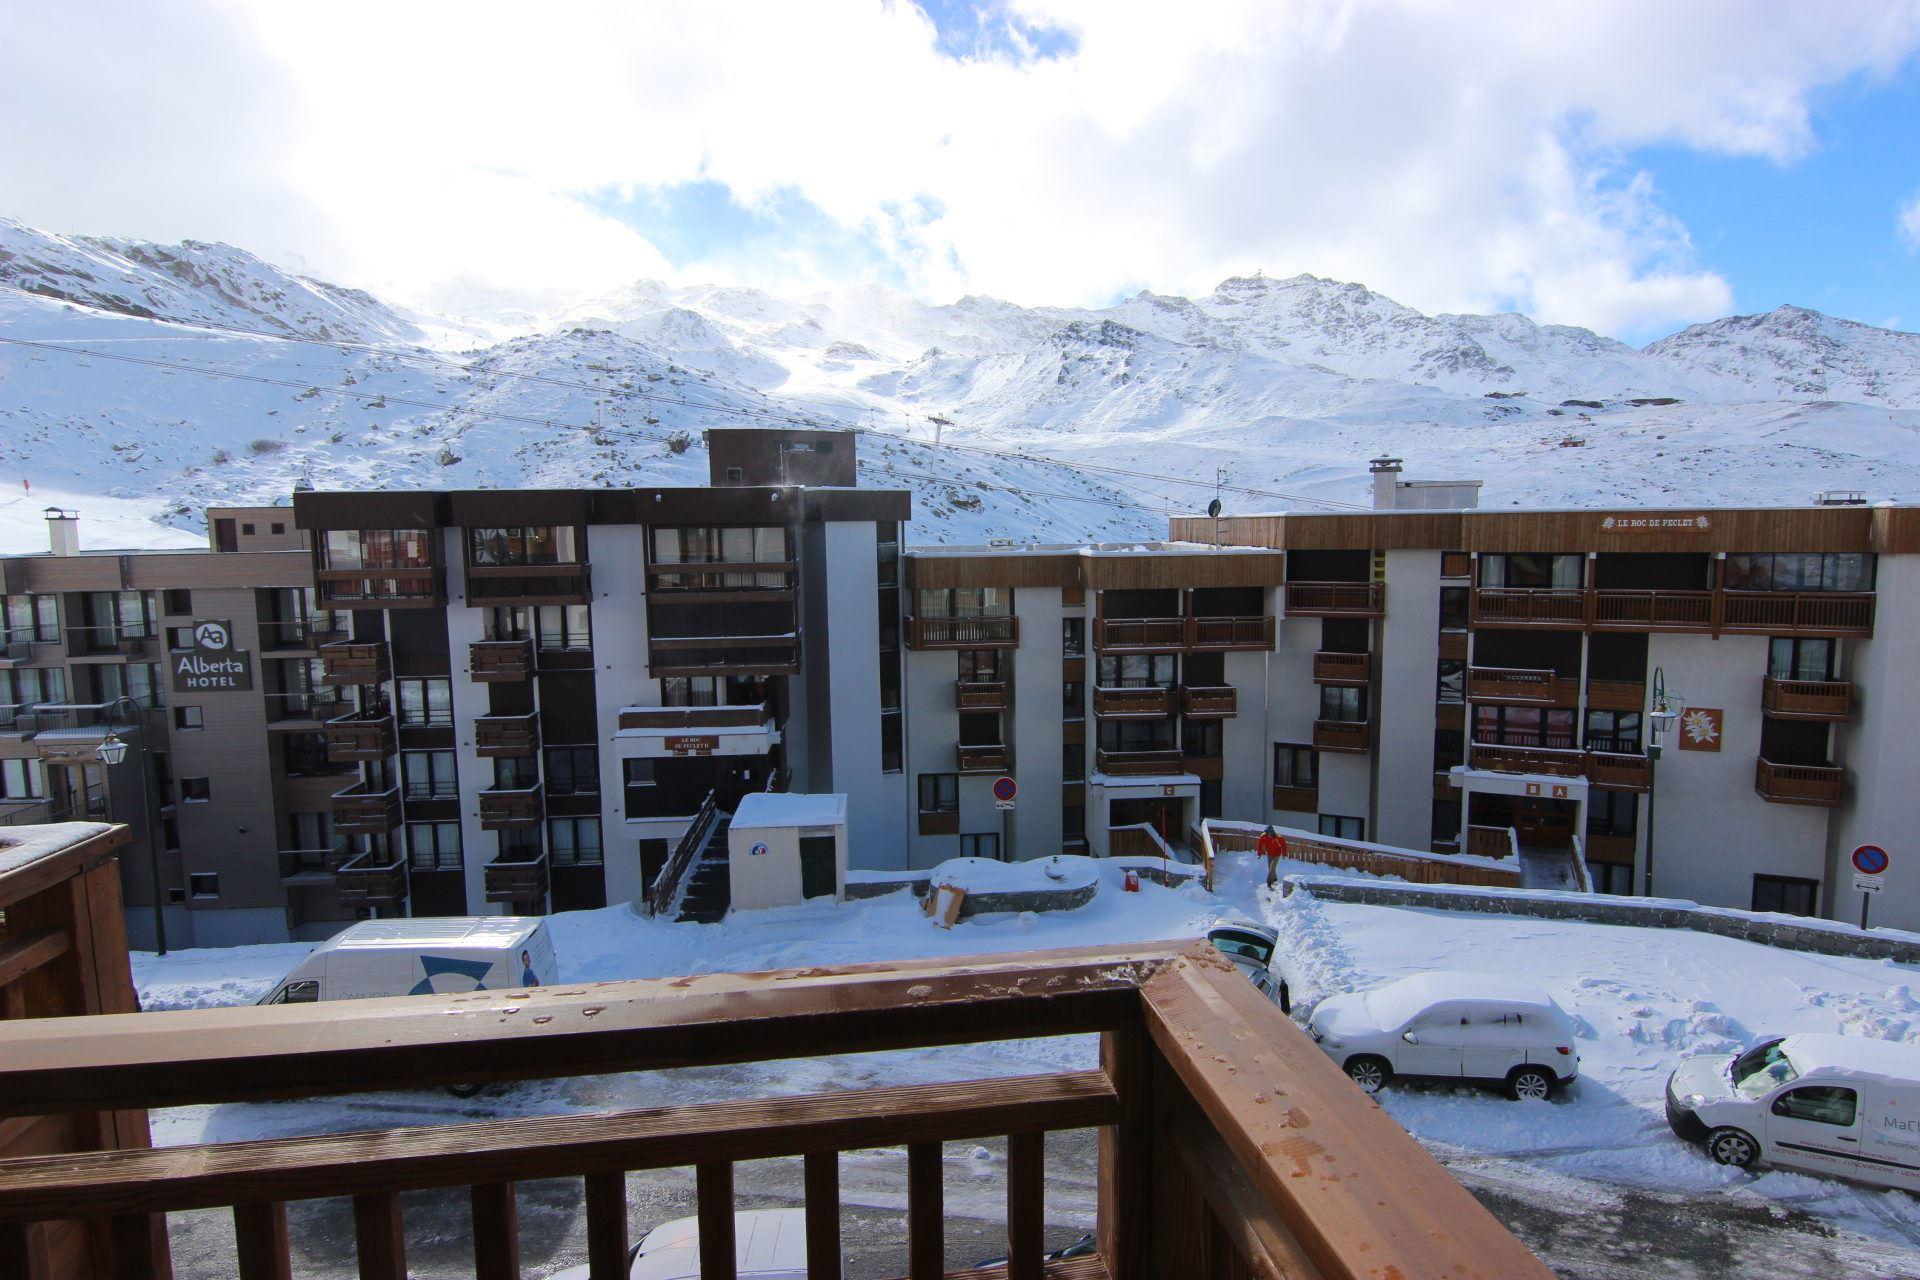 HAUTS DE CHAVIERE A12 / 3 ROOMS 6 PERSONS - 3 GOLD SNOWFLAKES - VTI